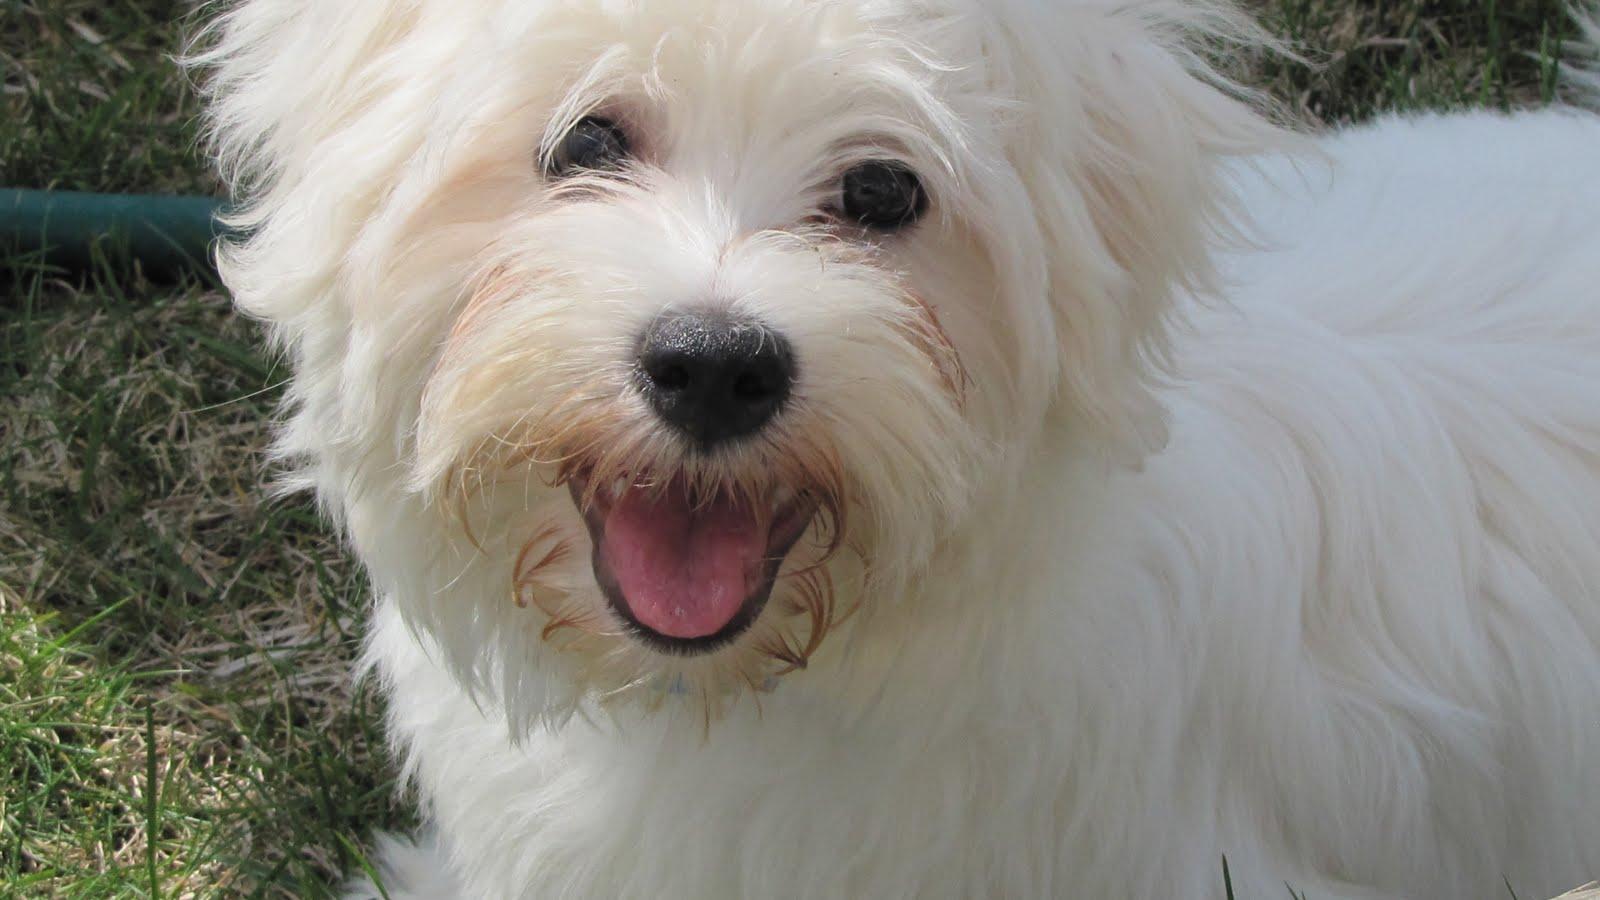 Cotonshoppens How To DIY dog haircut  YouTube